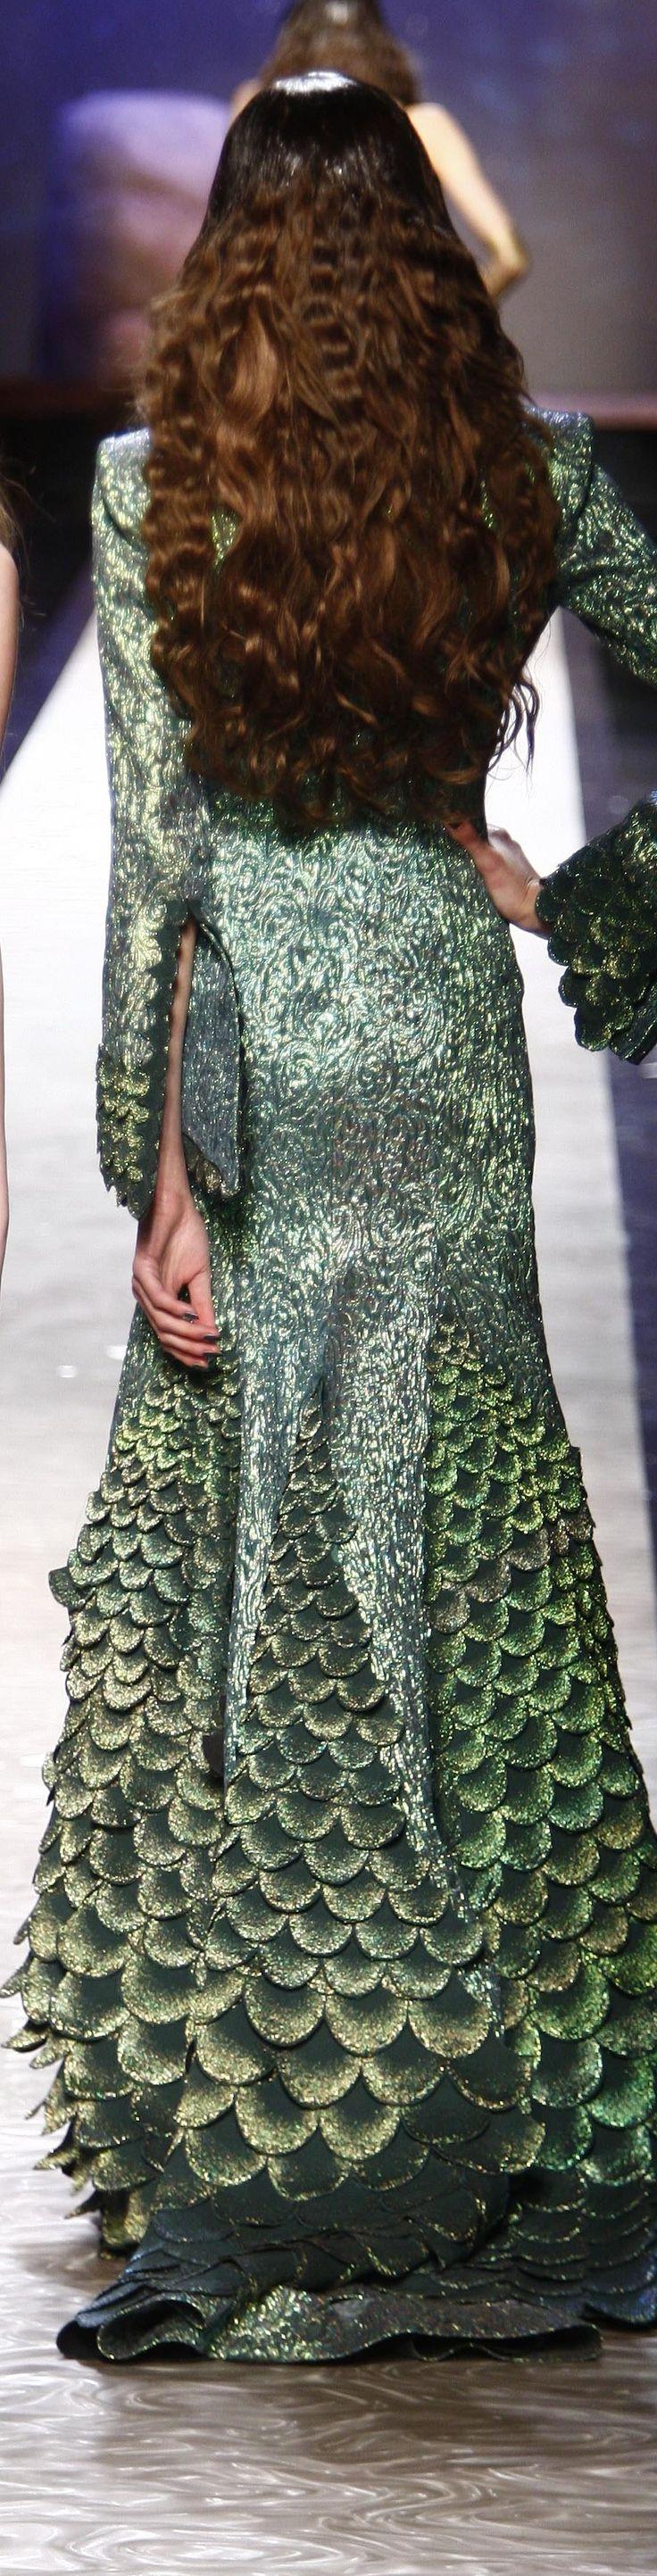 Jean Paul Gaultier ~ Love her hair.